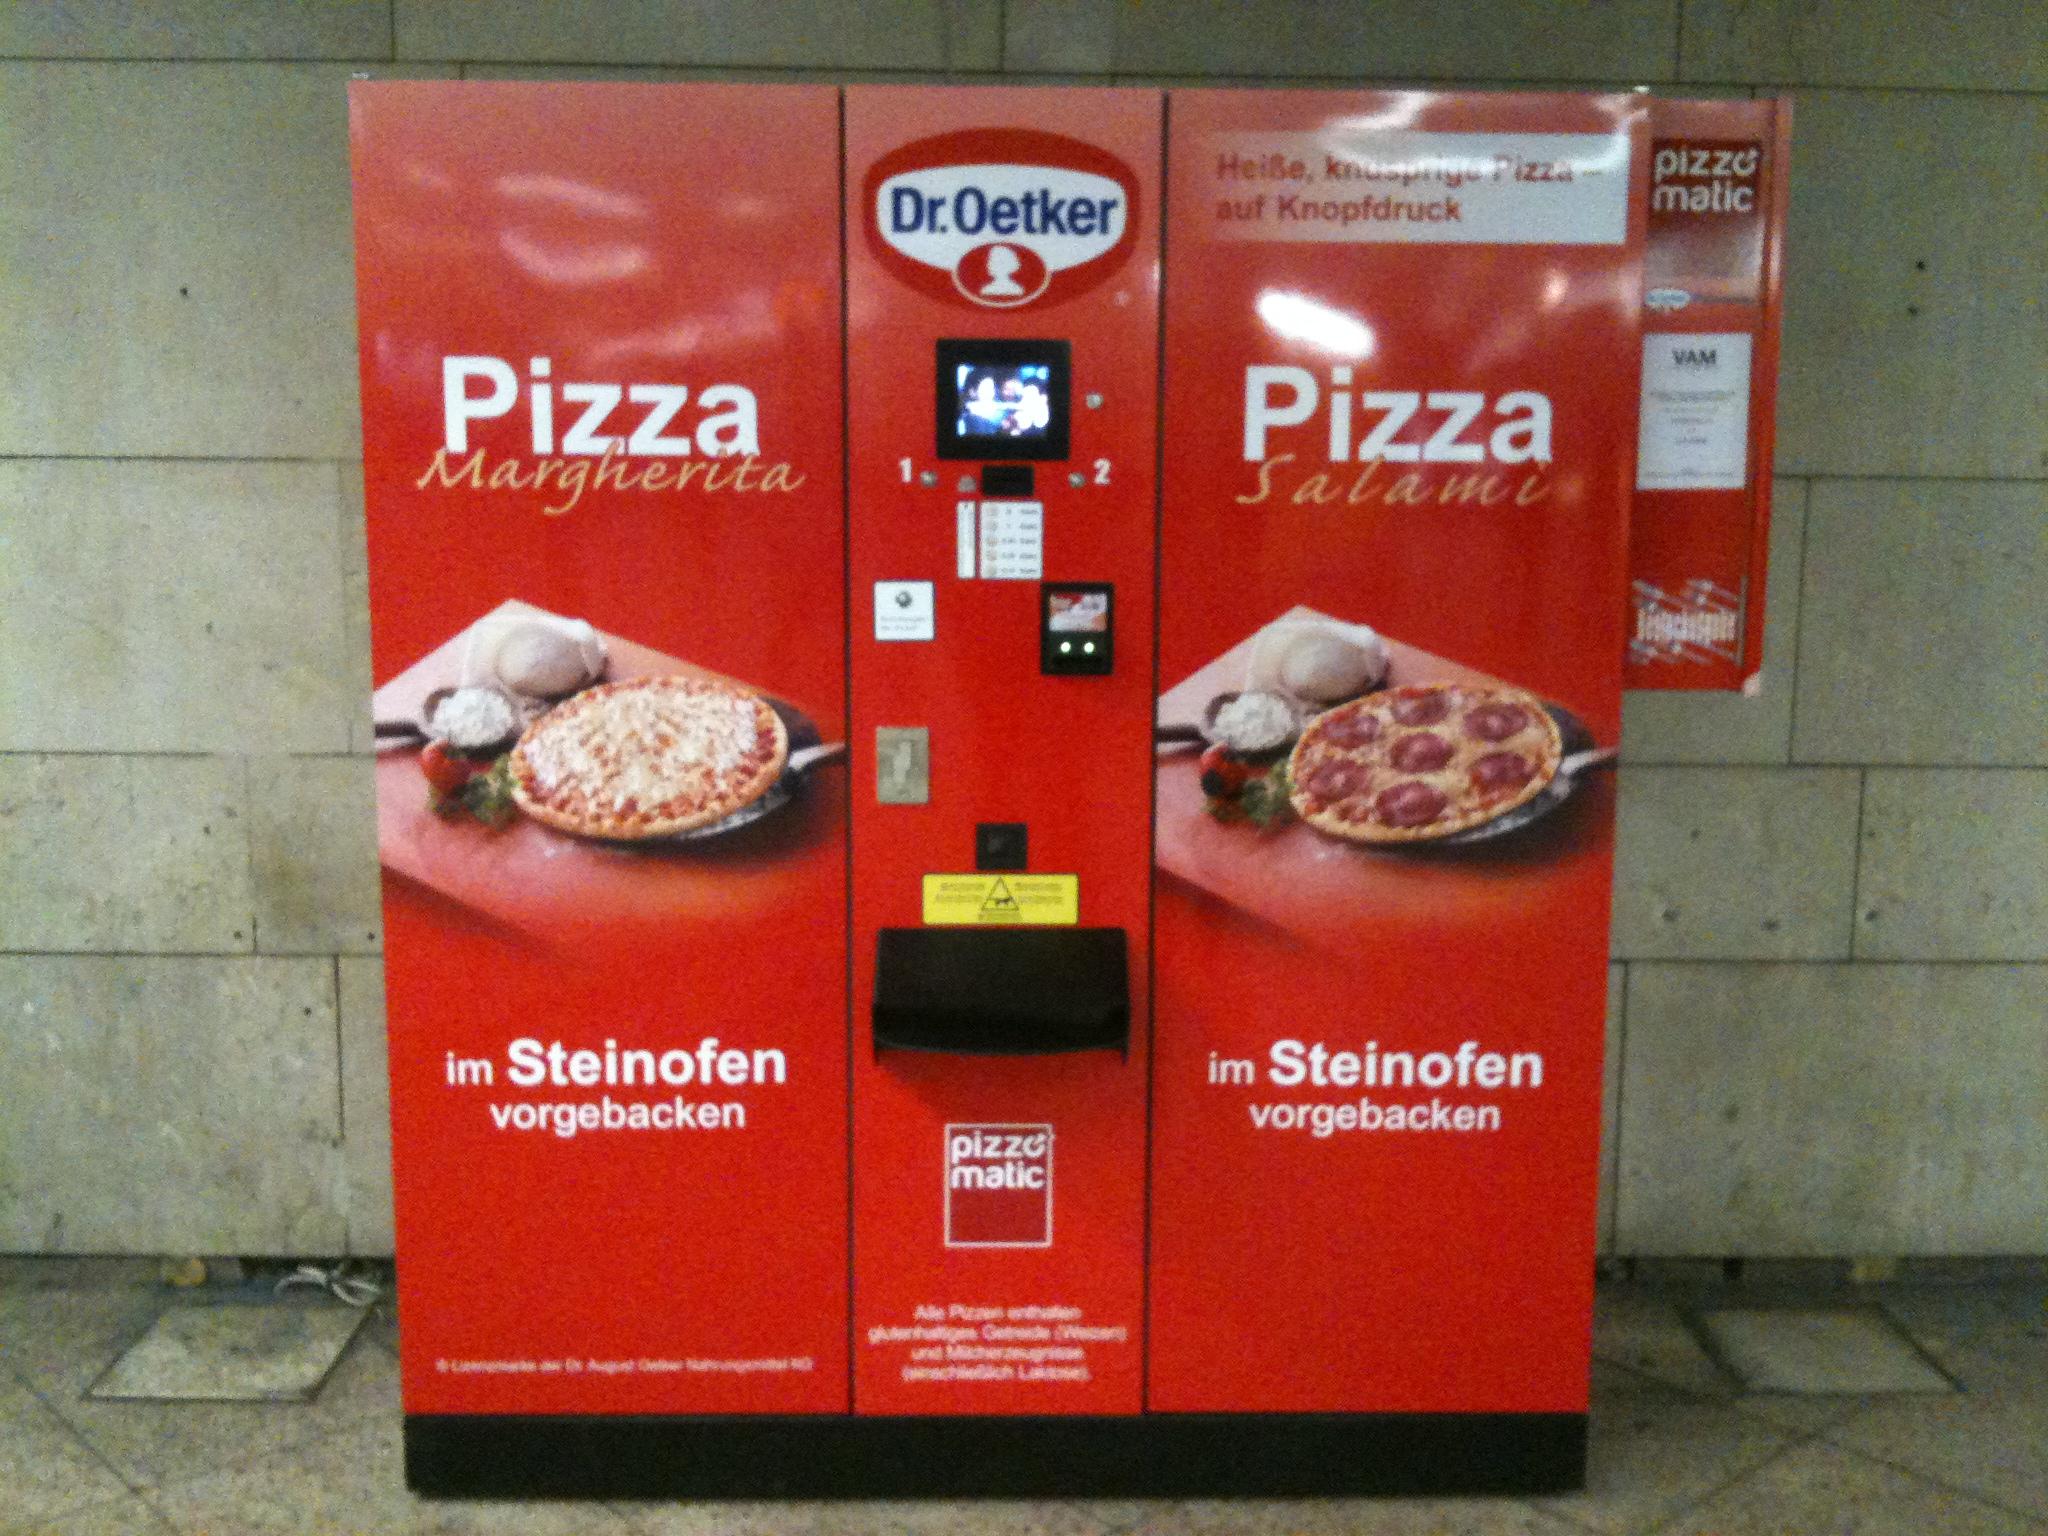 pizzomatic der pizza automat im hauptbahnhof frankfurt stadtkind. Black Bedroom Furniture Sets. Home Design Ideas